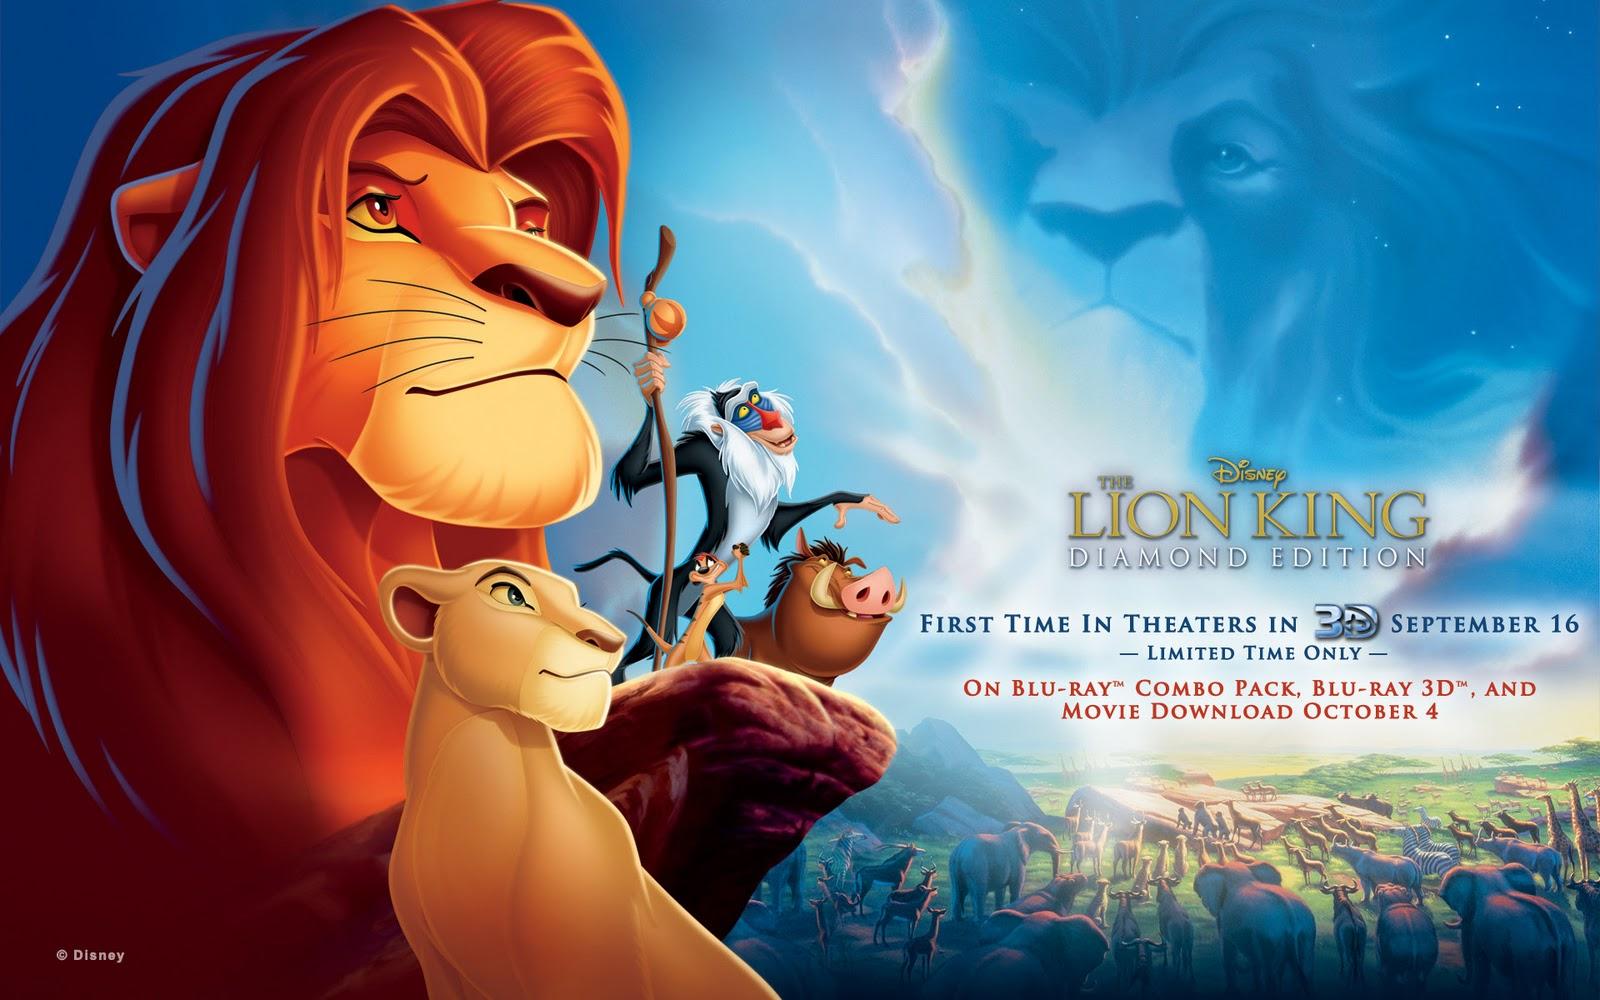 http://1.bp.blogspot.com/-2EewOC6gtKc/Tvbz-L35j2I/AAAAAAAACUo/PZVVriy-xLQ/s1600/The-Lion-King-3D-Wallpaper-02.jpg